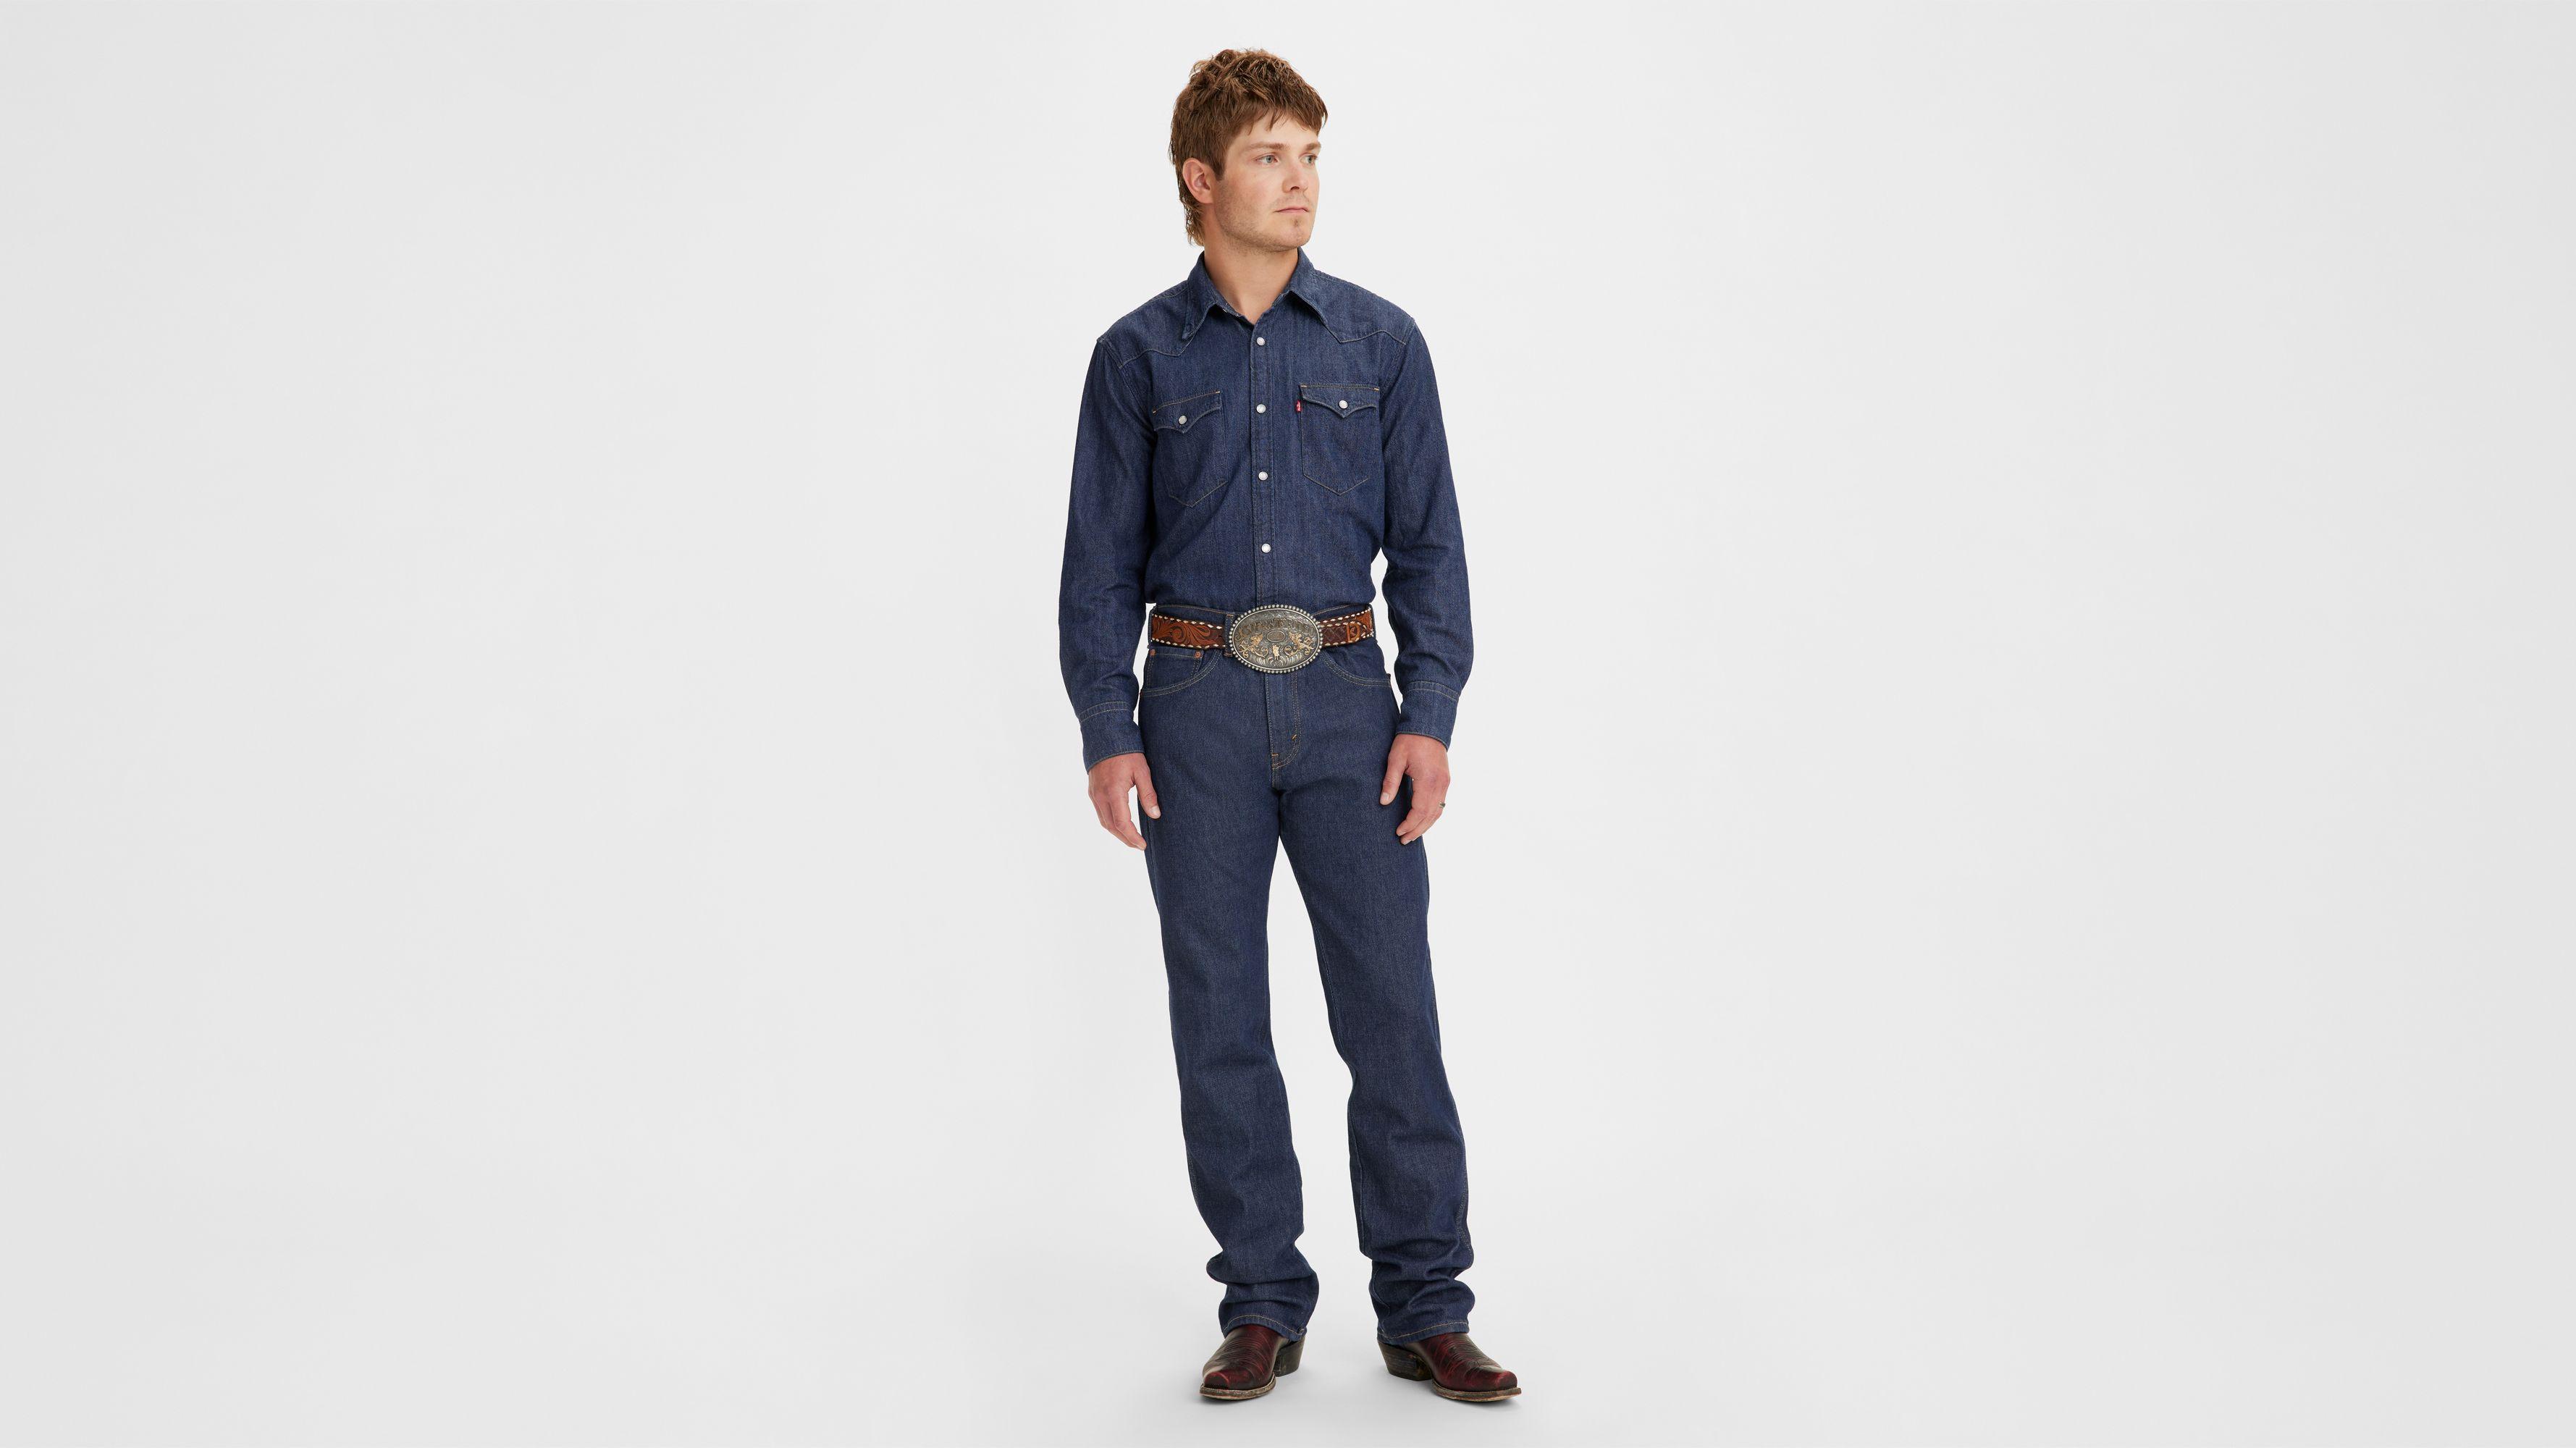 Levis Western Fit Mens Jeans